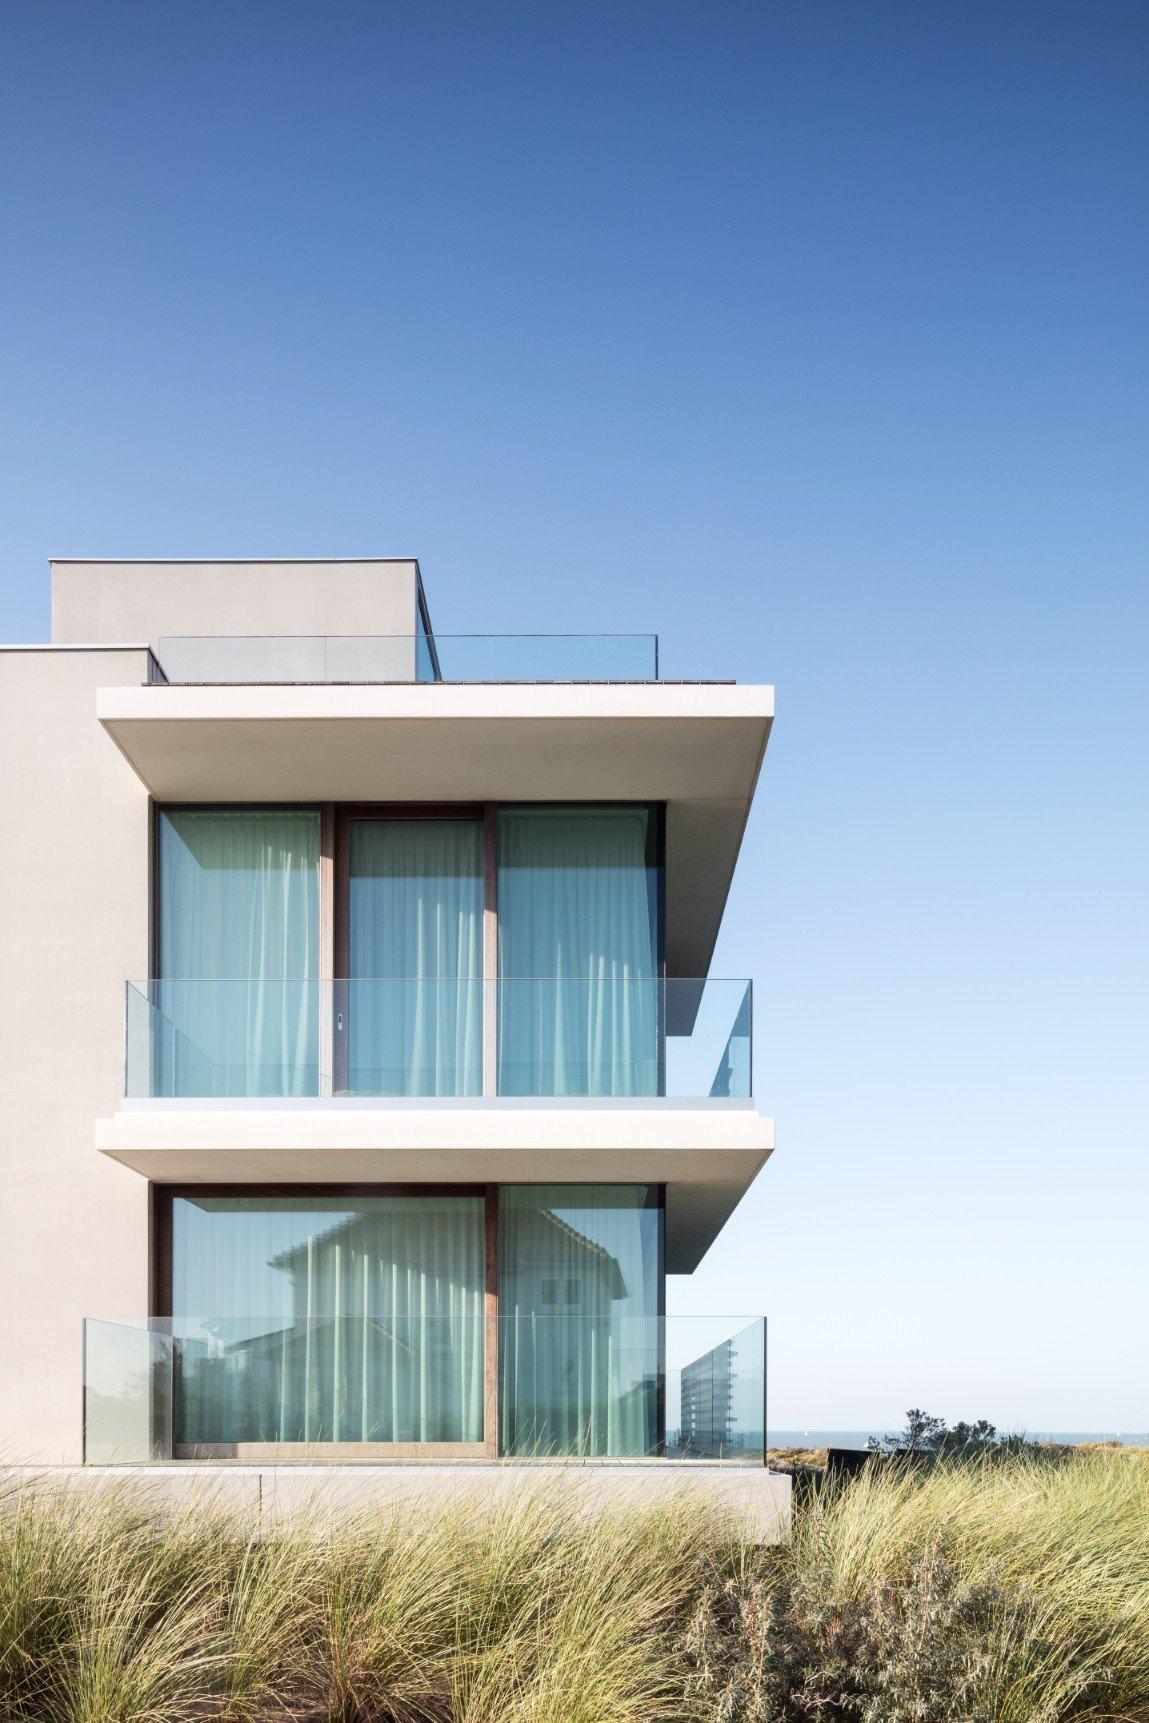 Rietveldprojects-Residence-ON-appartement-design-architectuur-kust-tvdv3.jpg